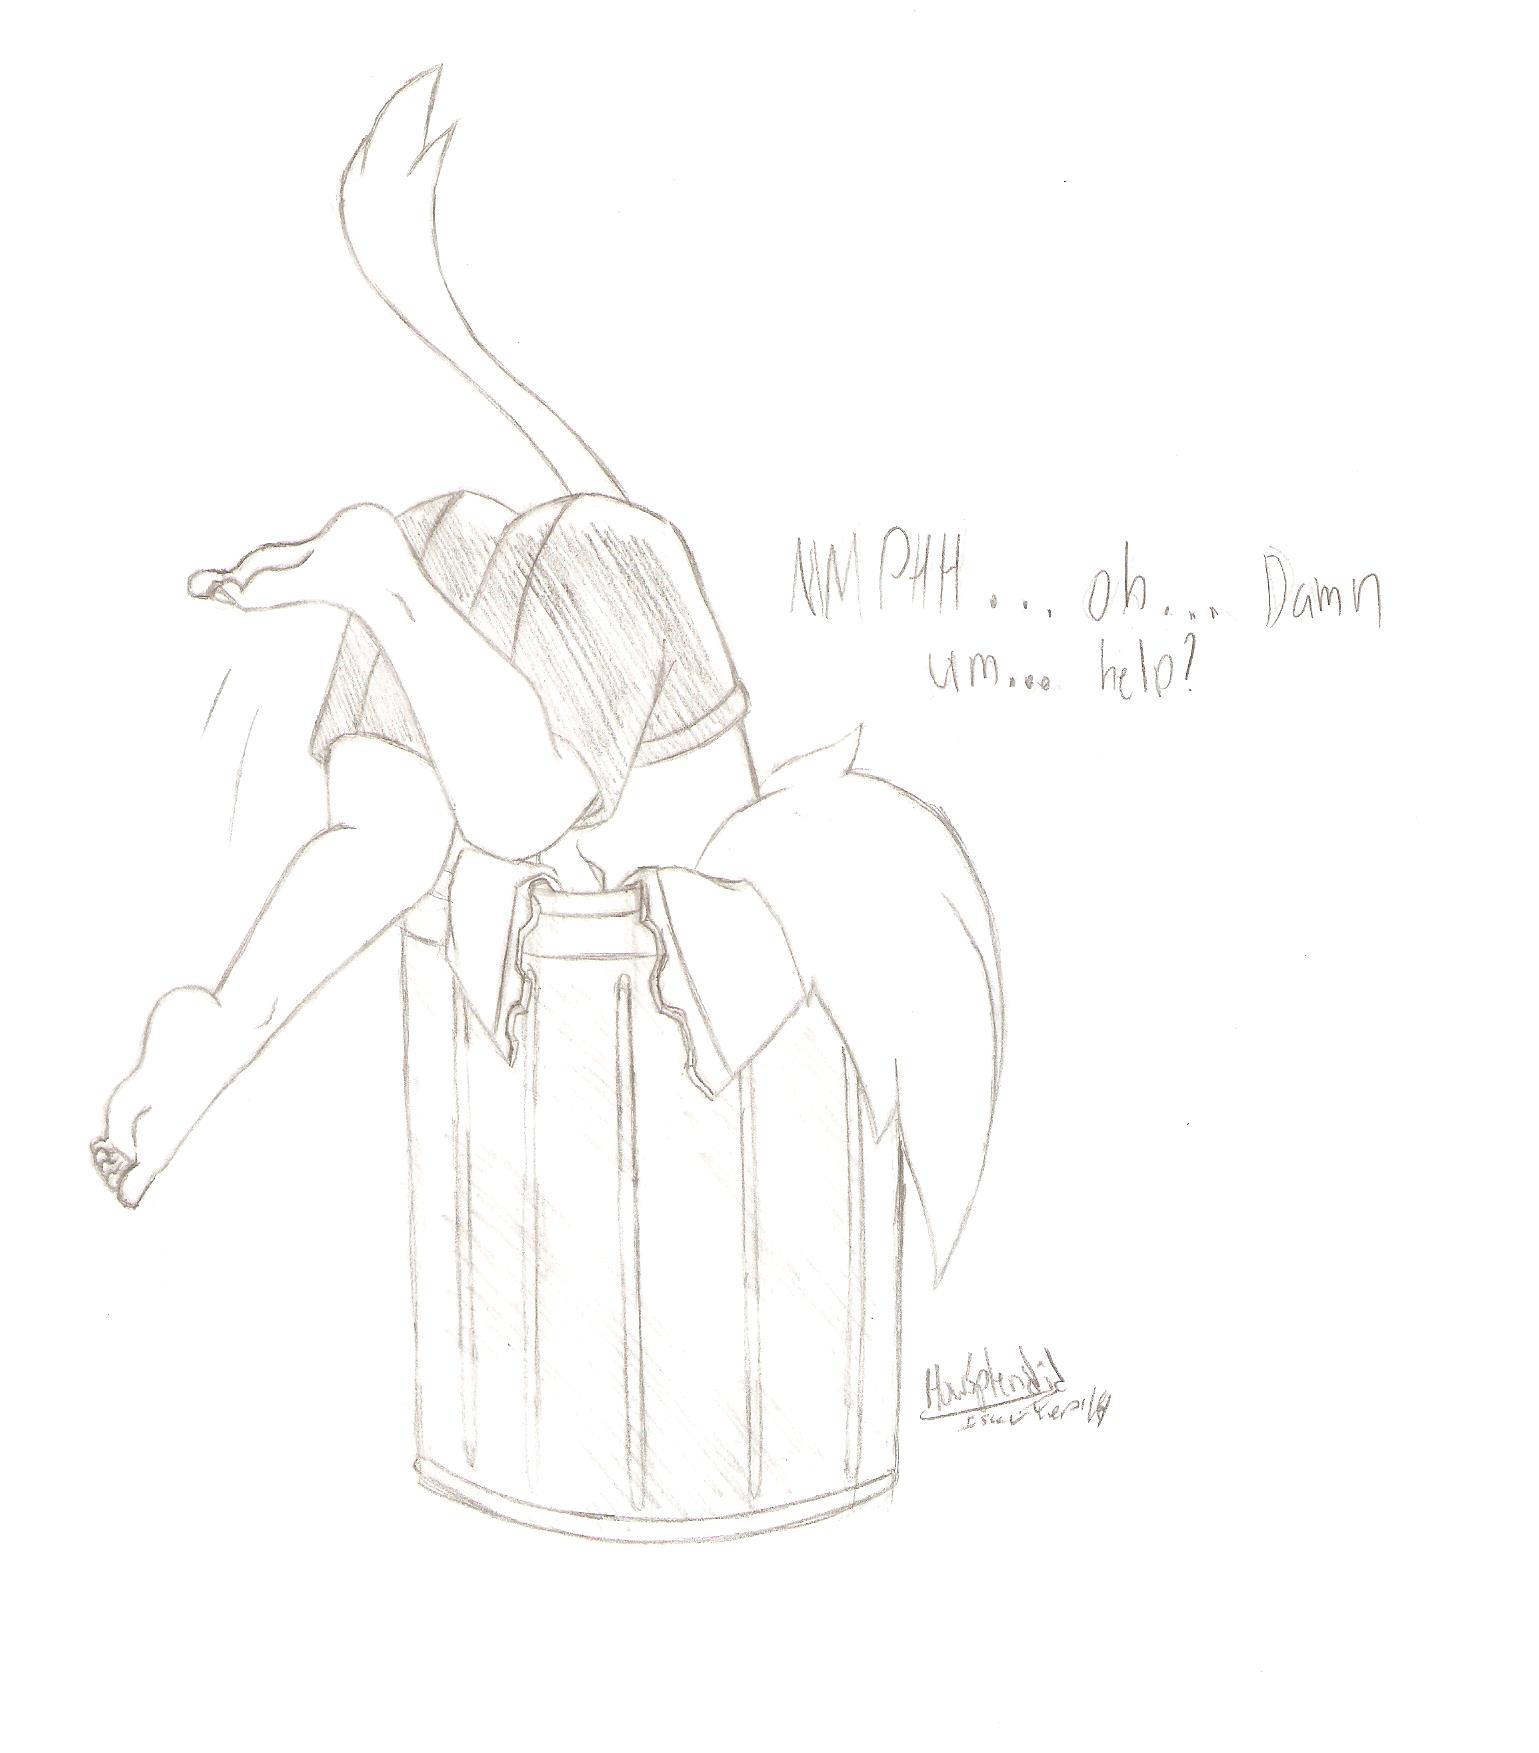 A cat in the trash